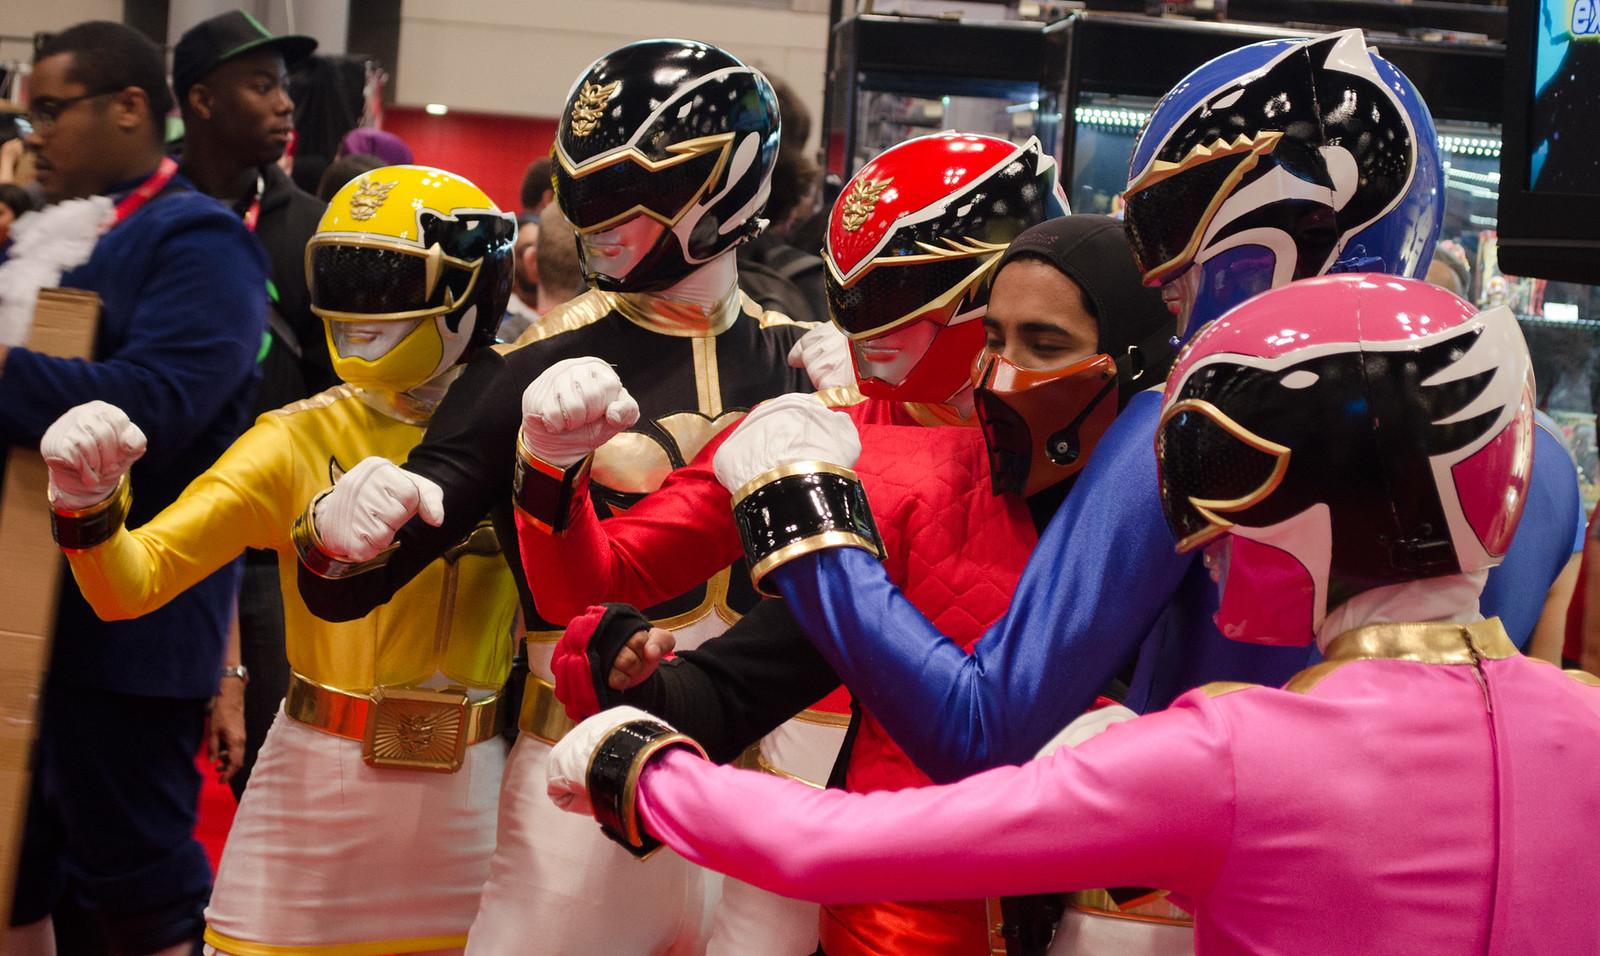 Power Ranger Cosplay